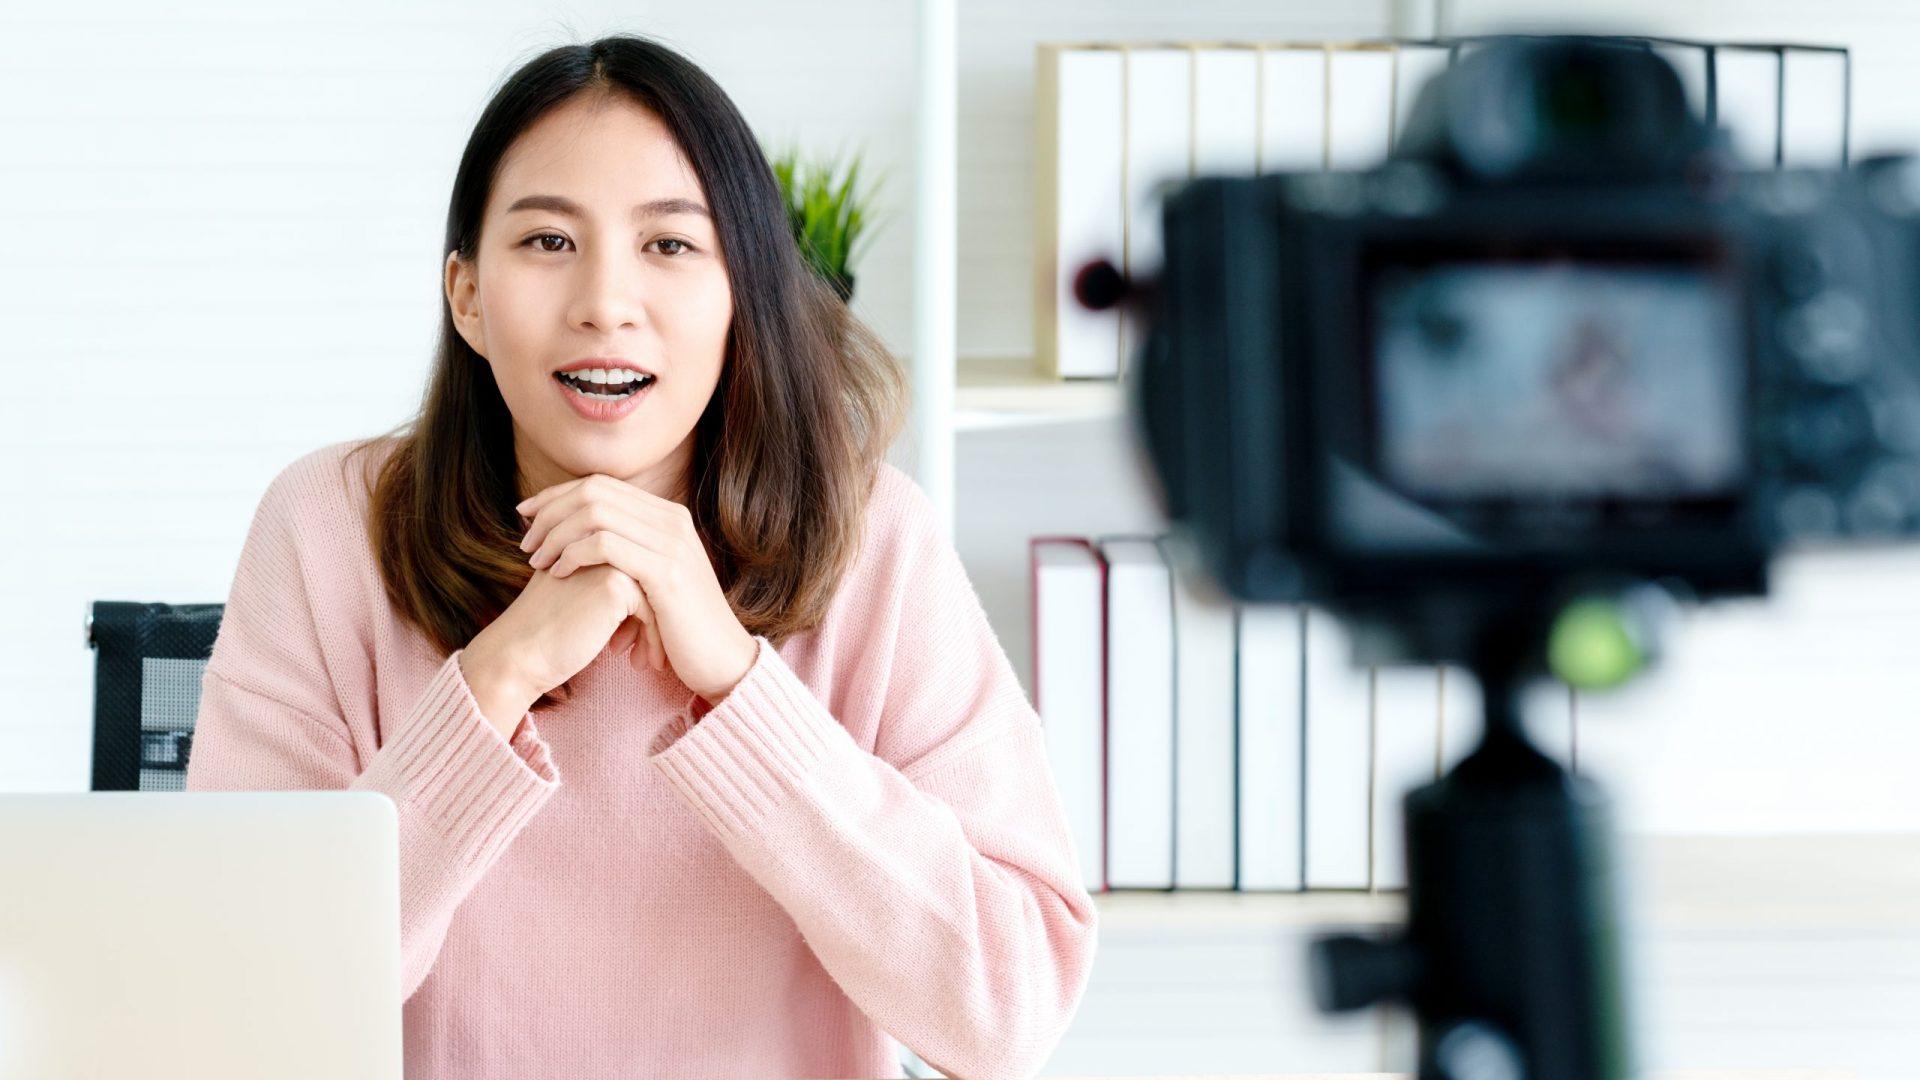 Young,Attractive,Asian,Woman,Blogger,Or,Vlogger,Looking,At,Camera